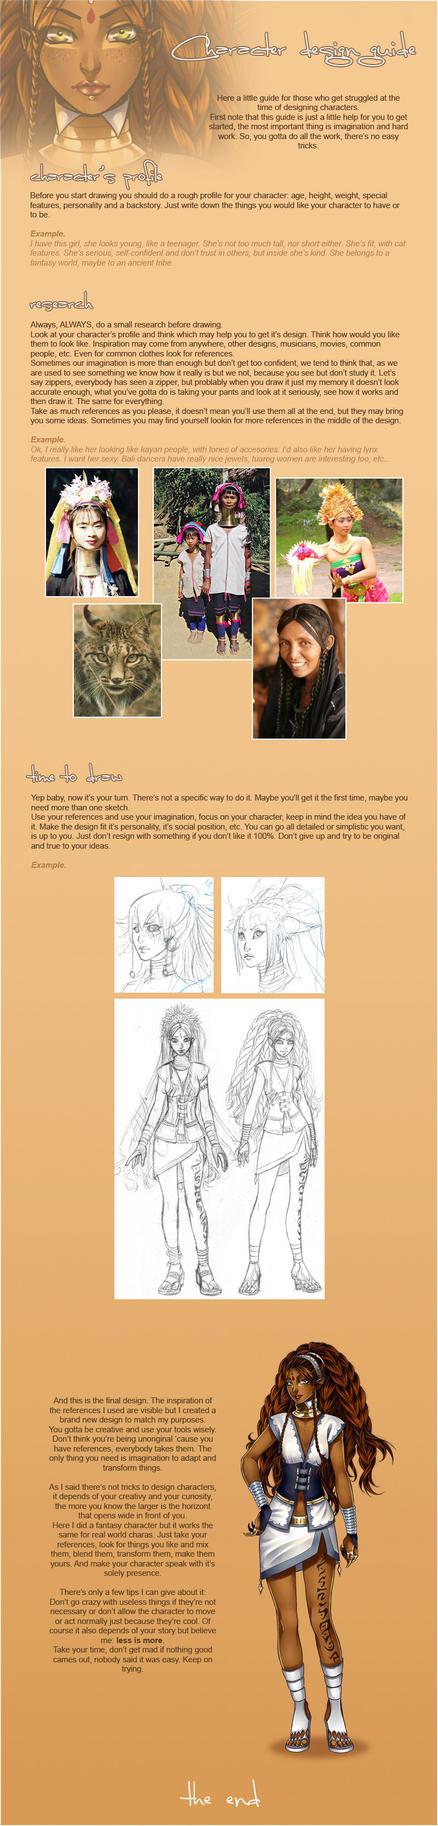 Character Design Tutorial Reddit : Character design tutorials on mangaworkshop deviantart